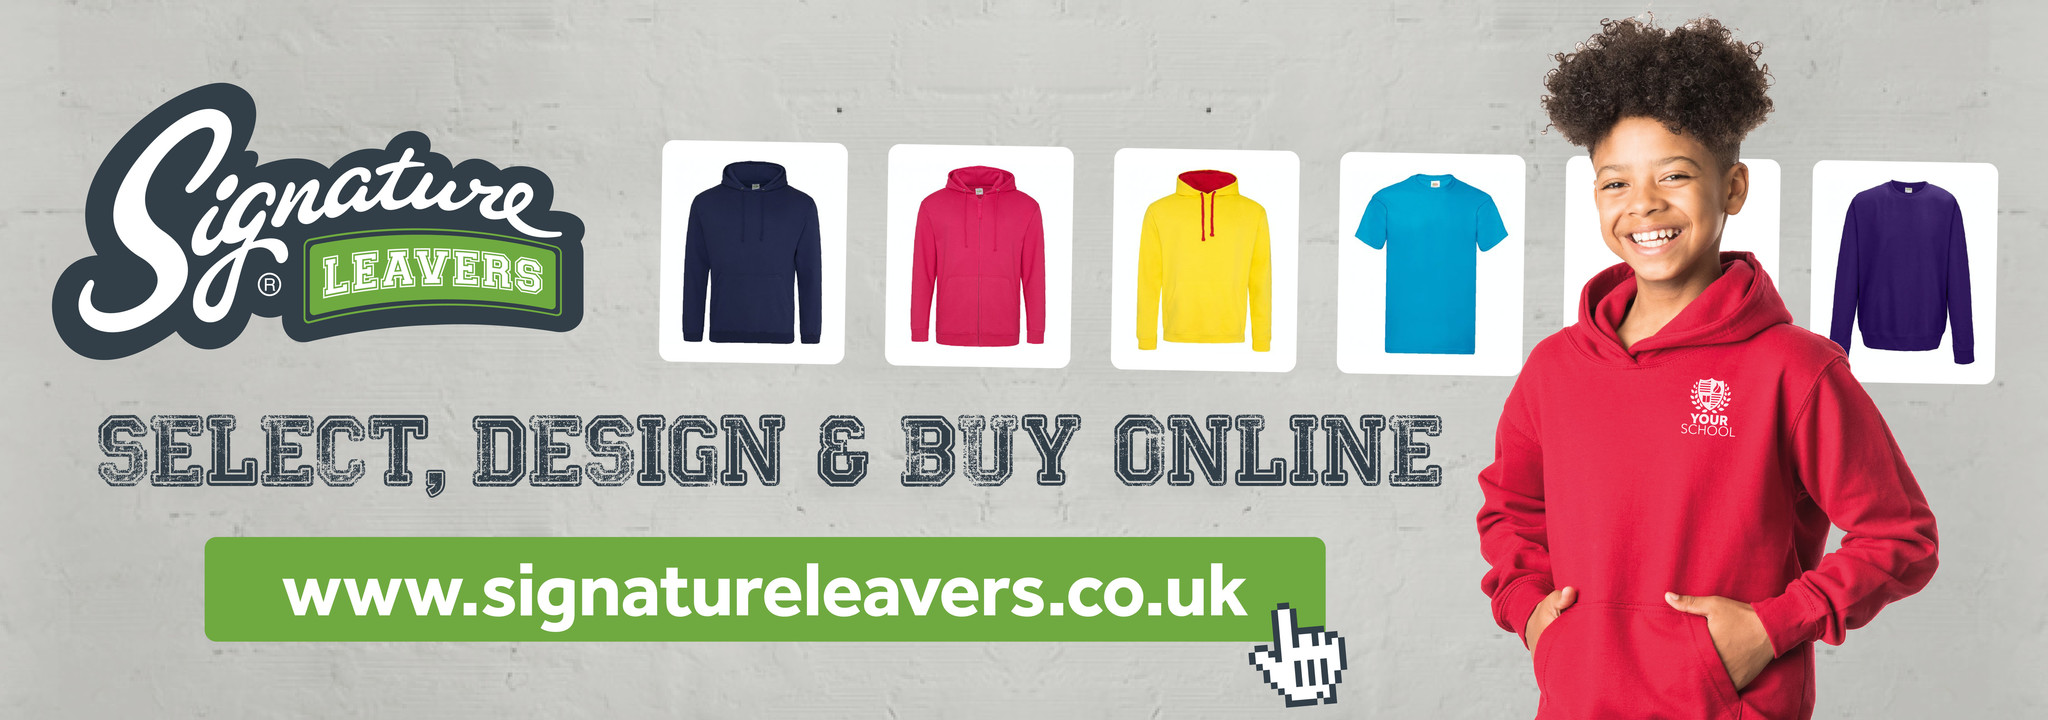 Signature Leavers 2